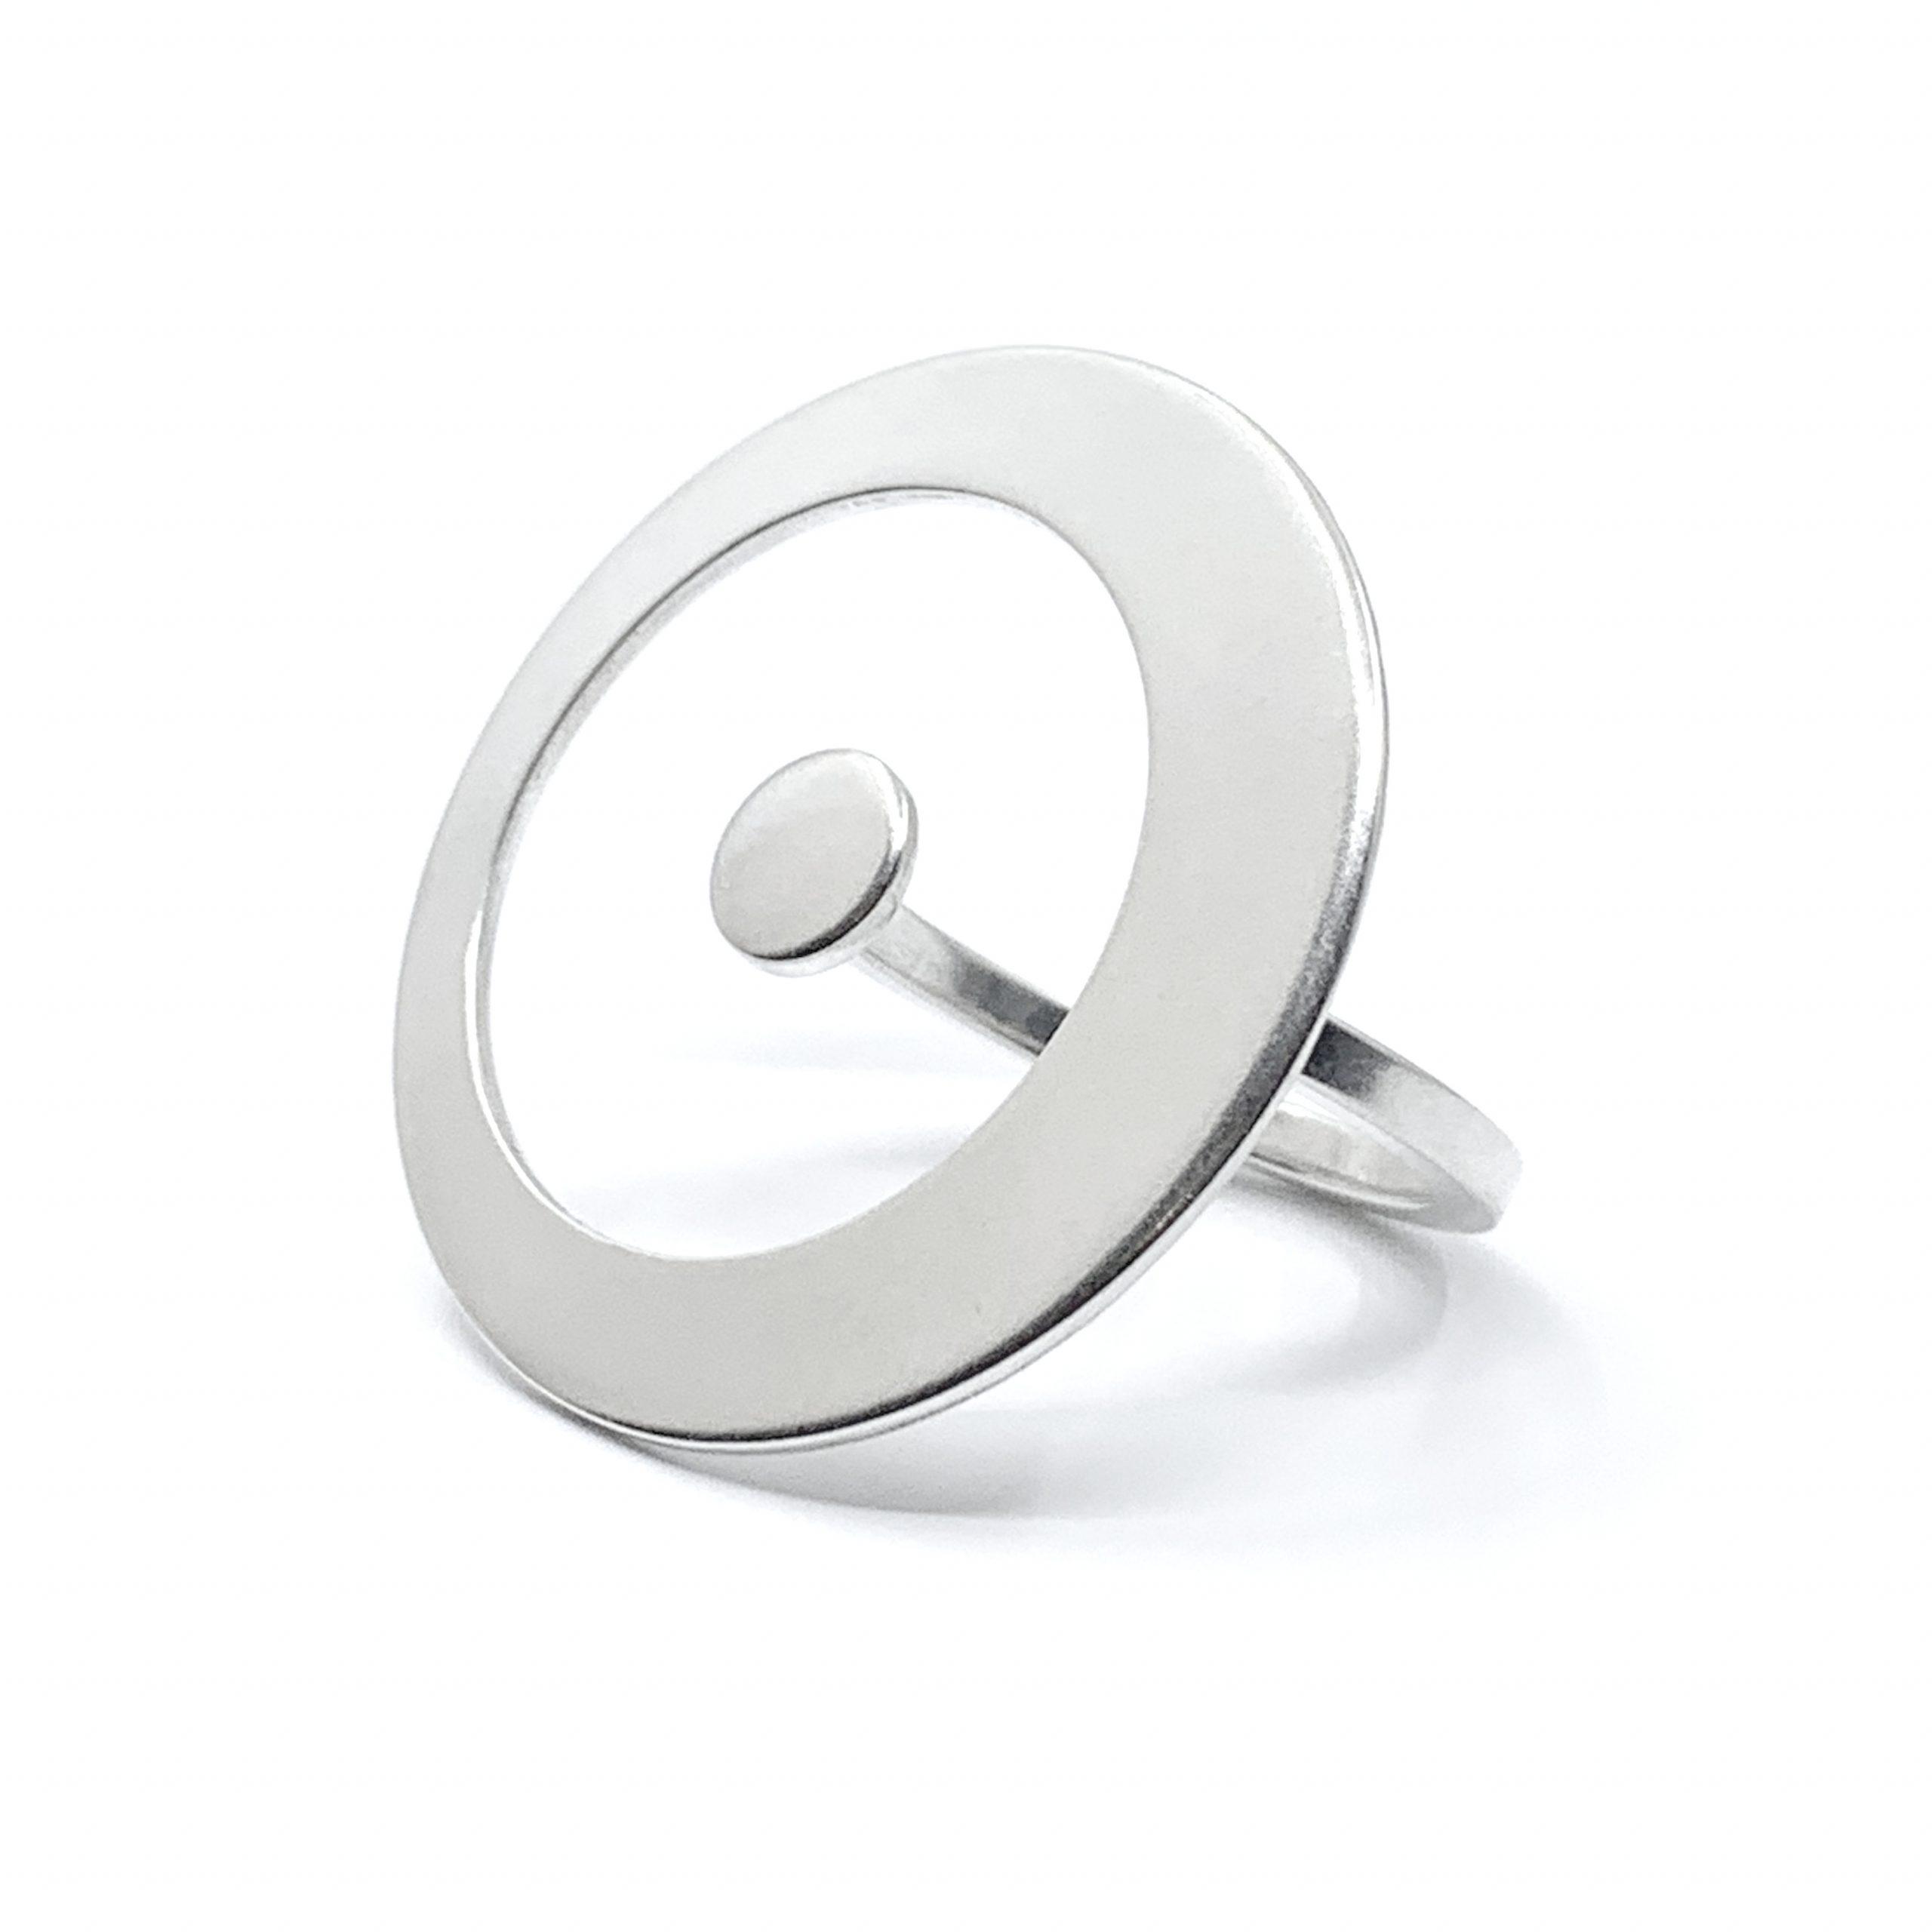 New orbit ring